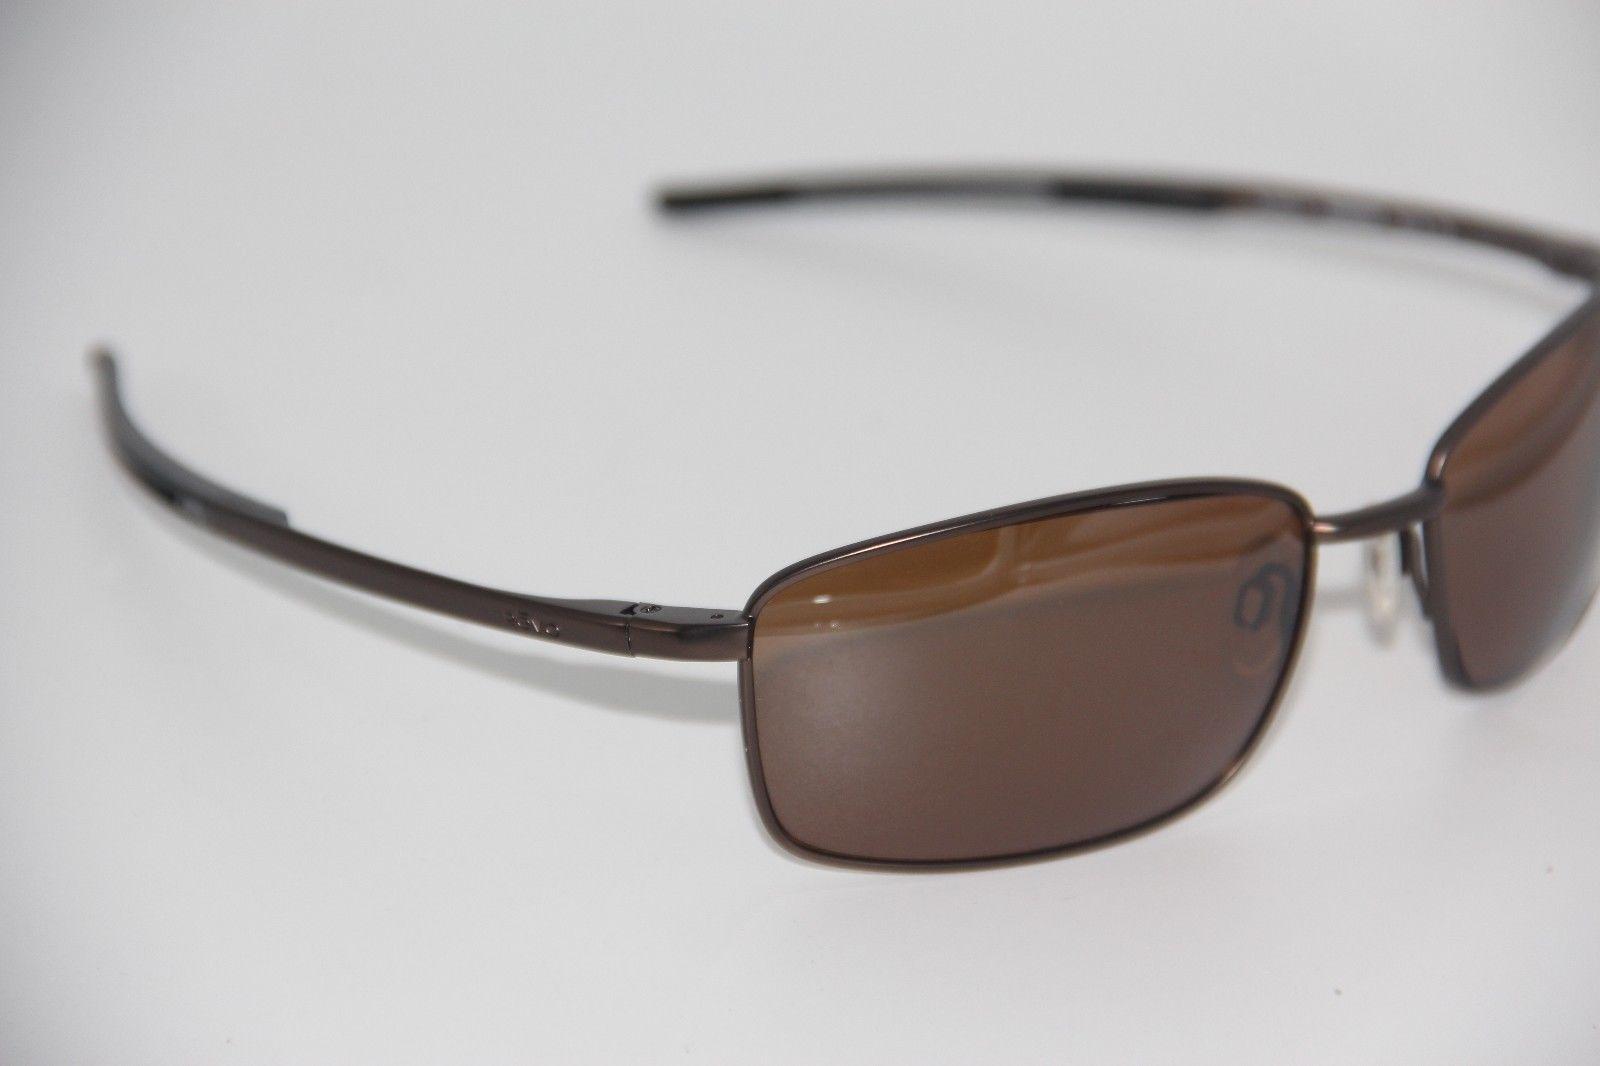 150e573f1b Revo Sunglasses Re 5000 X 02 Transport Brown and 36 similar items